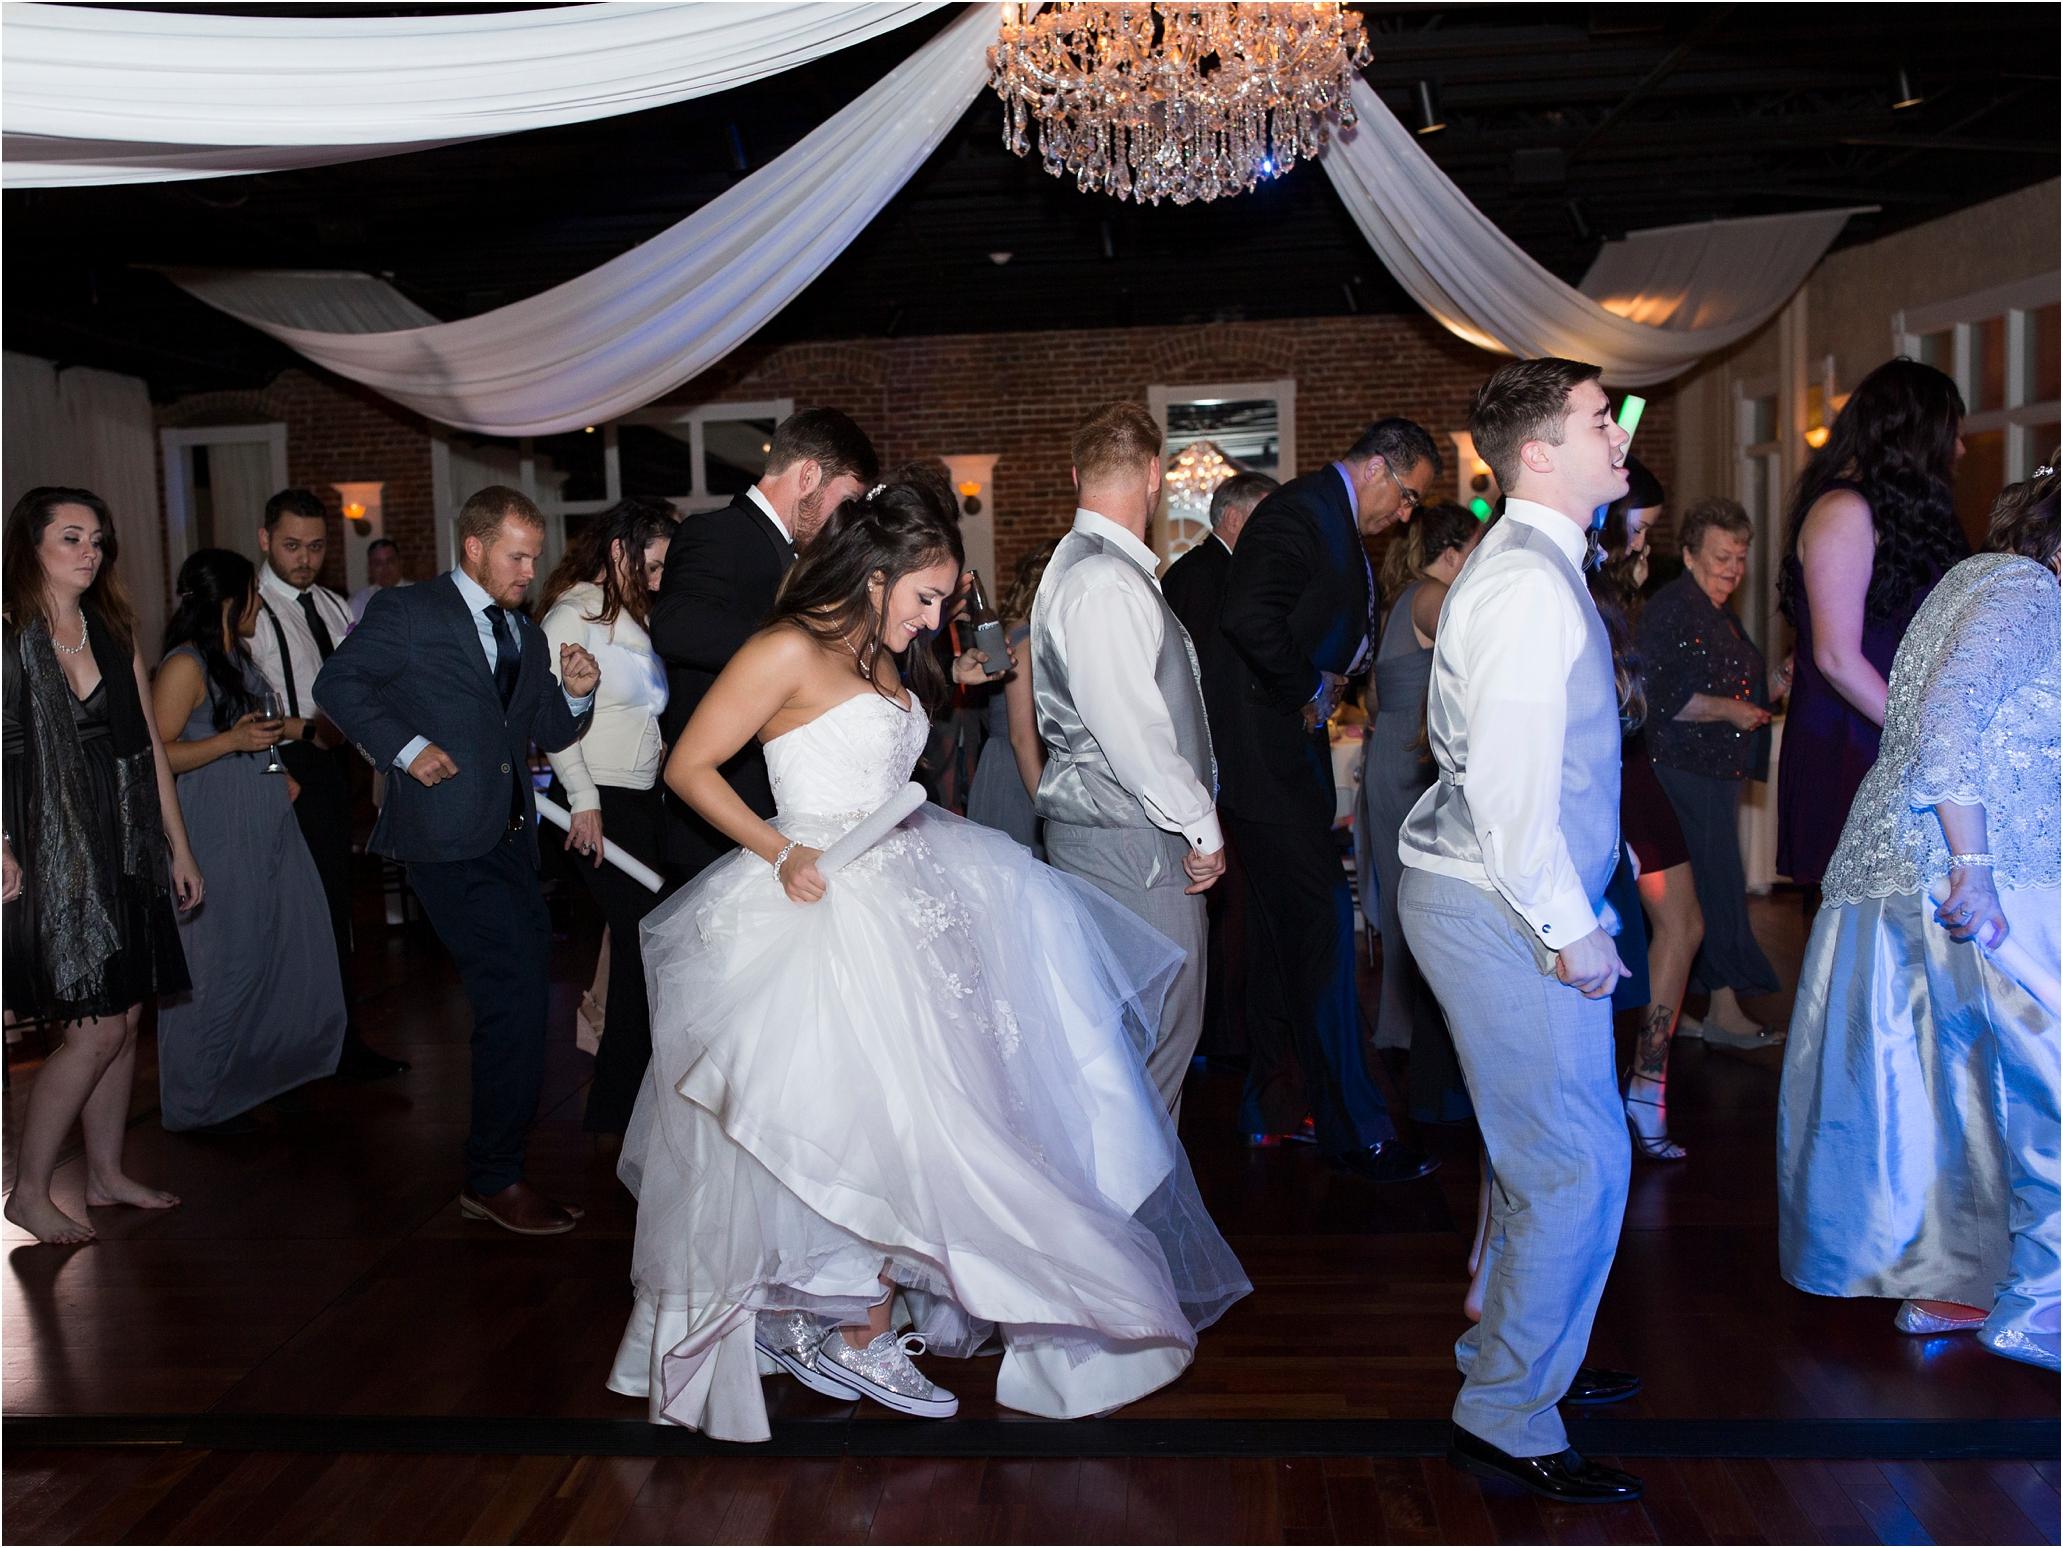 Lisa Silva Photography- Ponte Vedra Beach and Jacksonville, Florida Fine Art Film Wedding Photography- Wedding at The White Room Villa Blanca in St. Augustine, Florida_0070.jpg